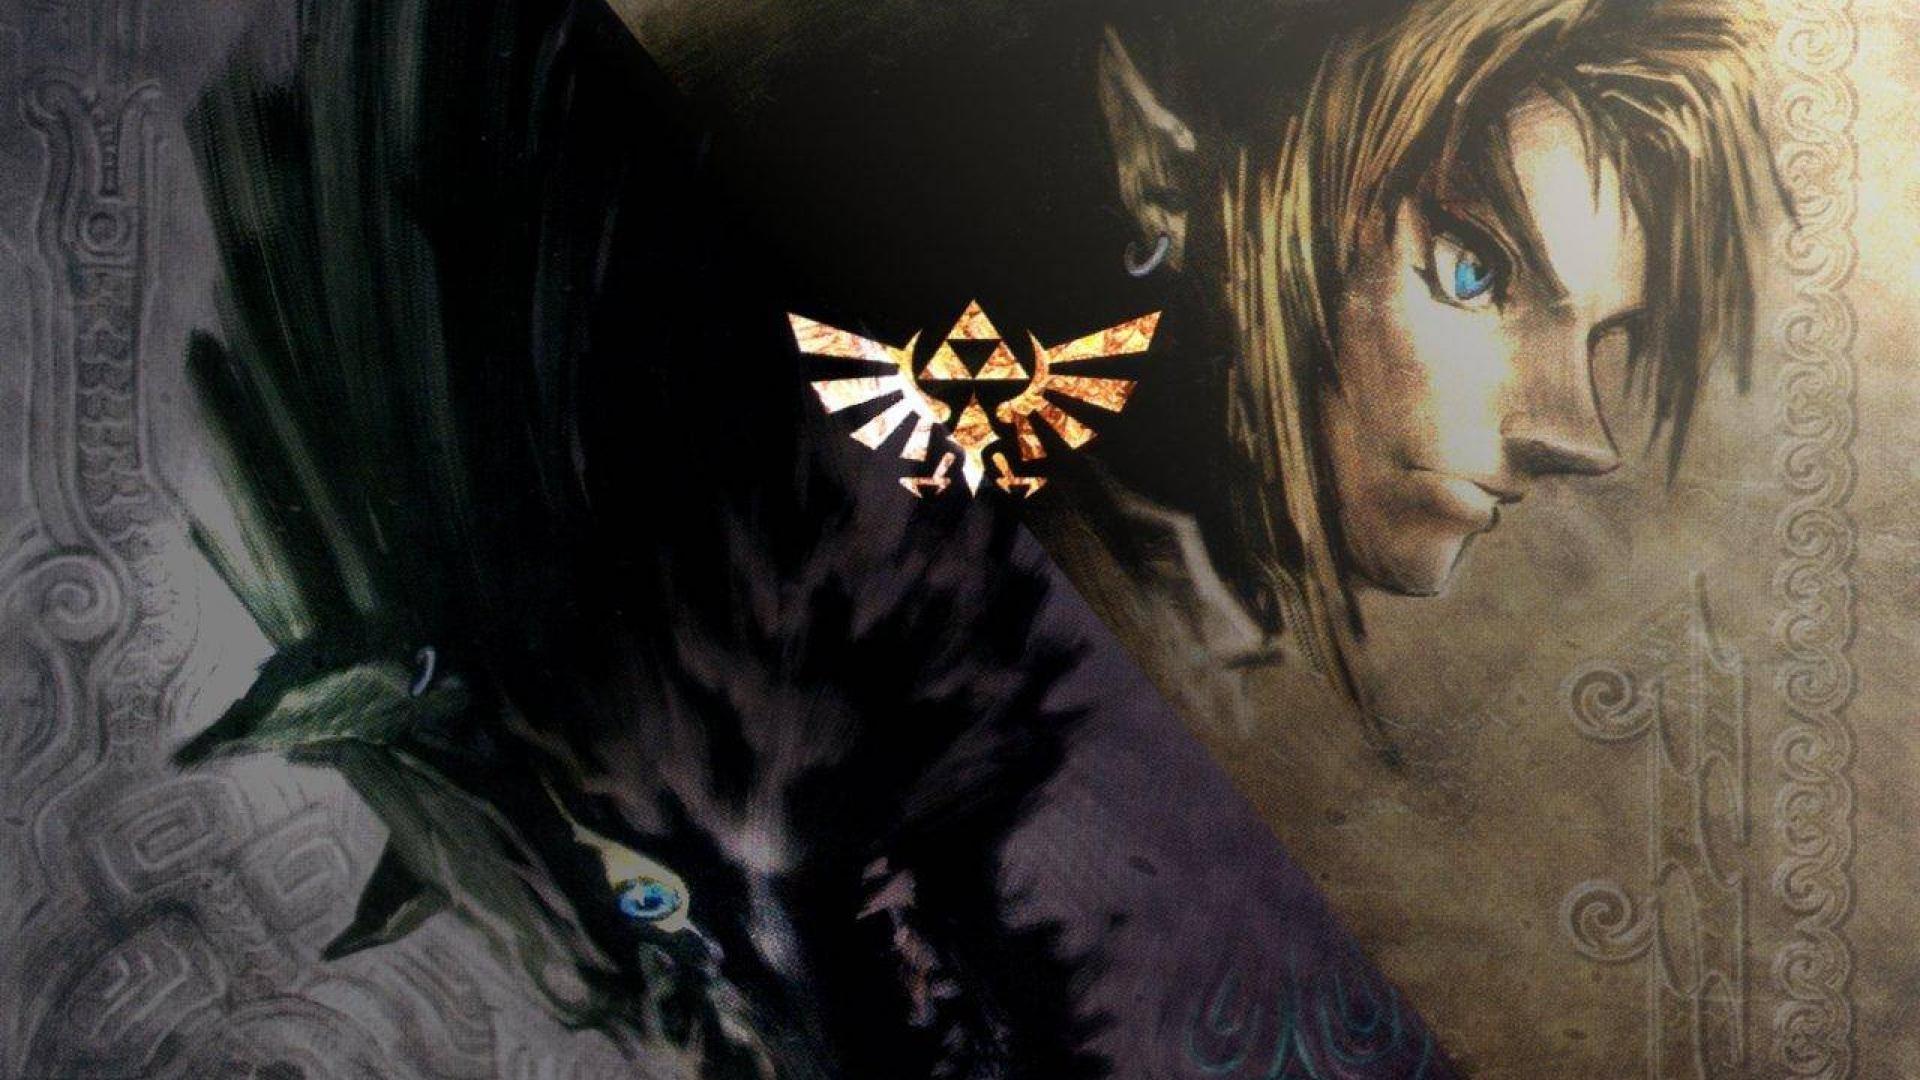 free legend of zelda twilight princess wallpaper high quality